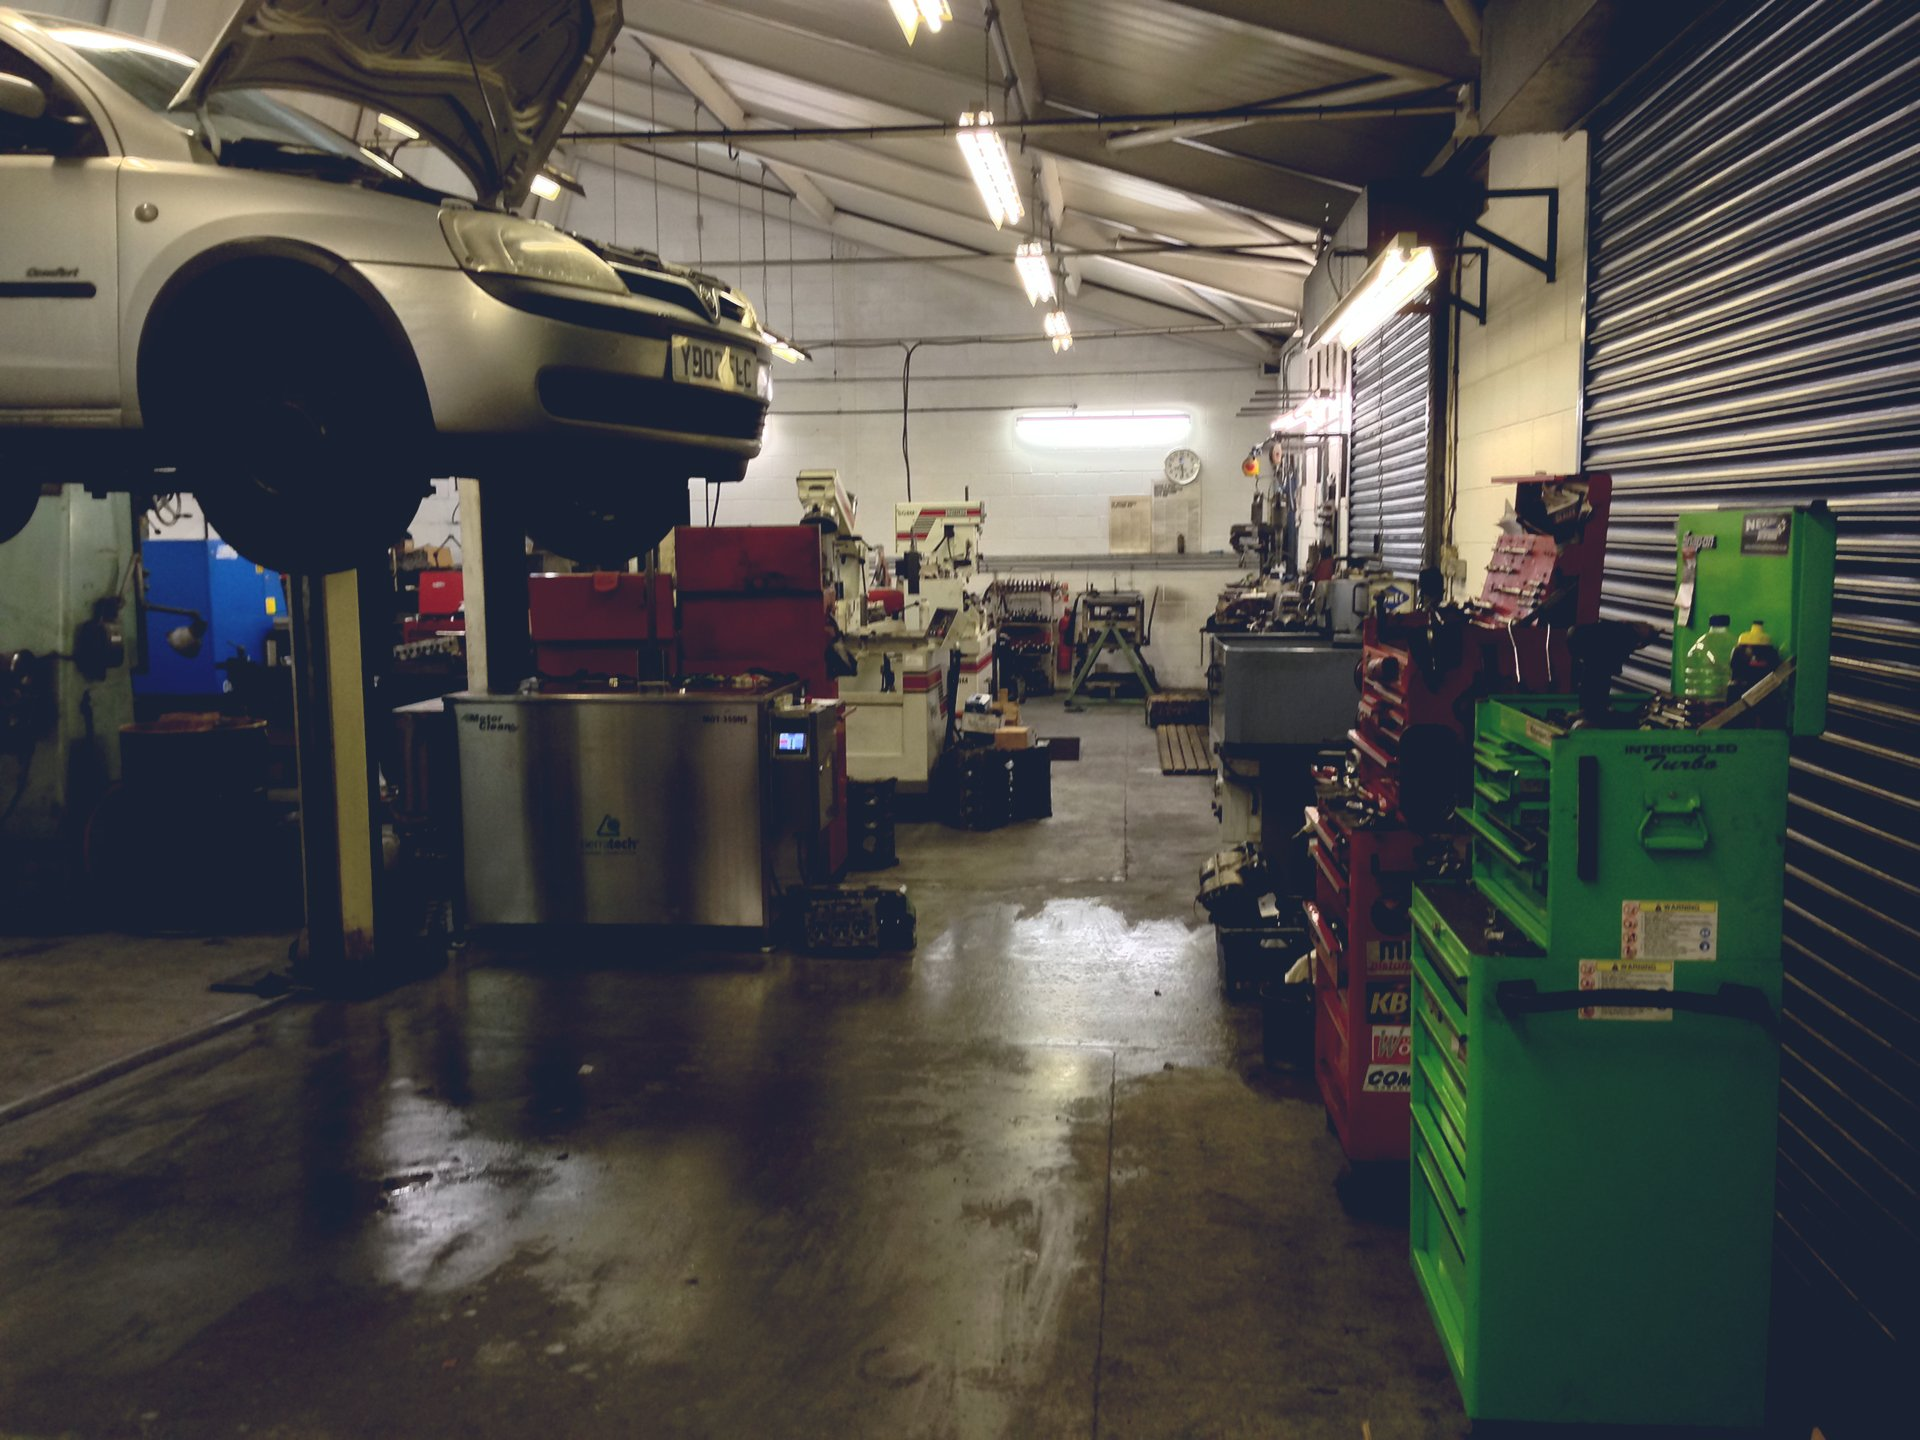 Workstation for cars